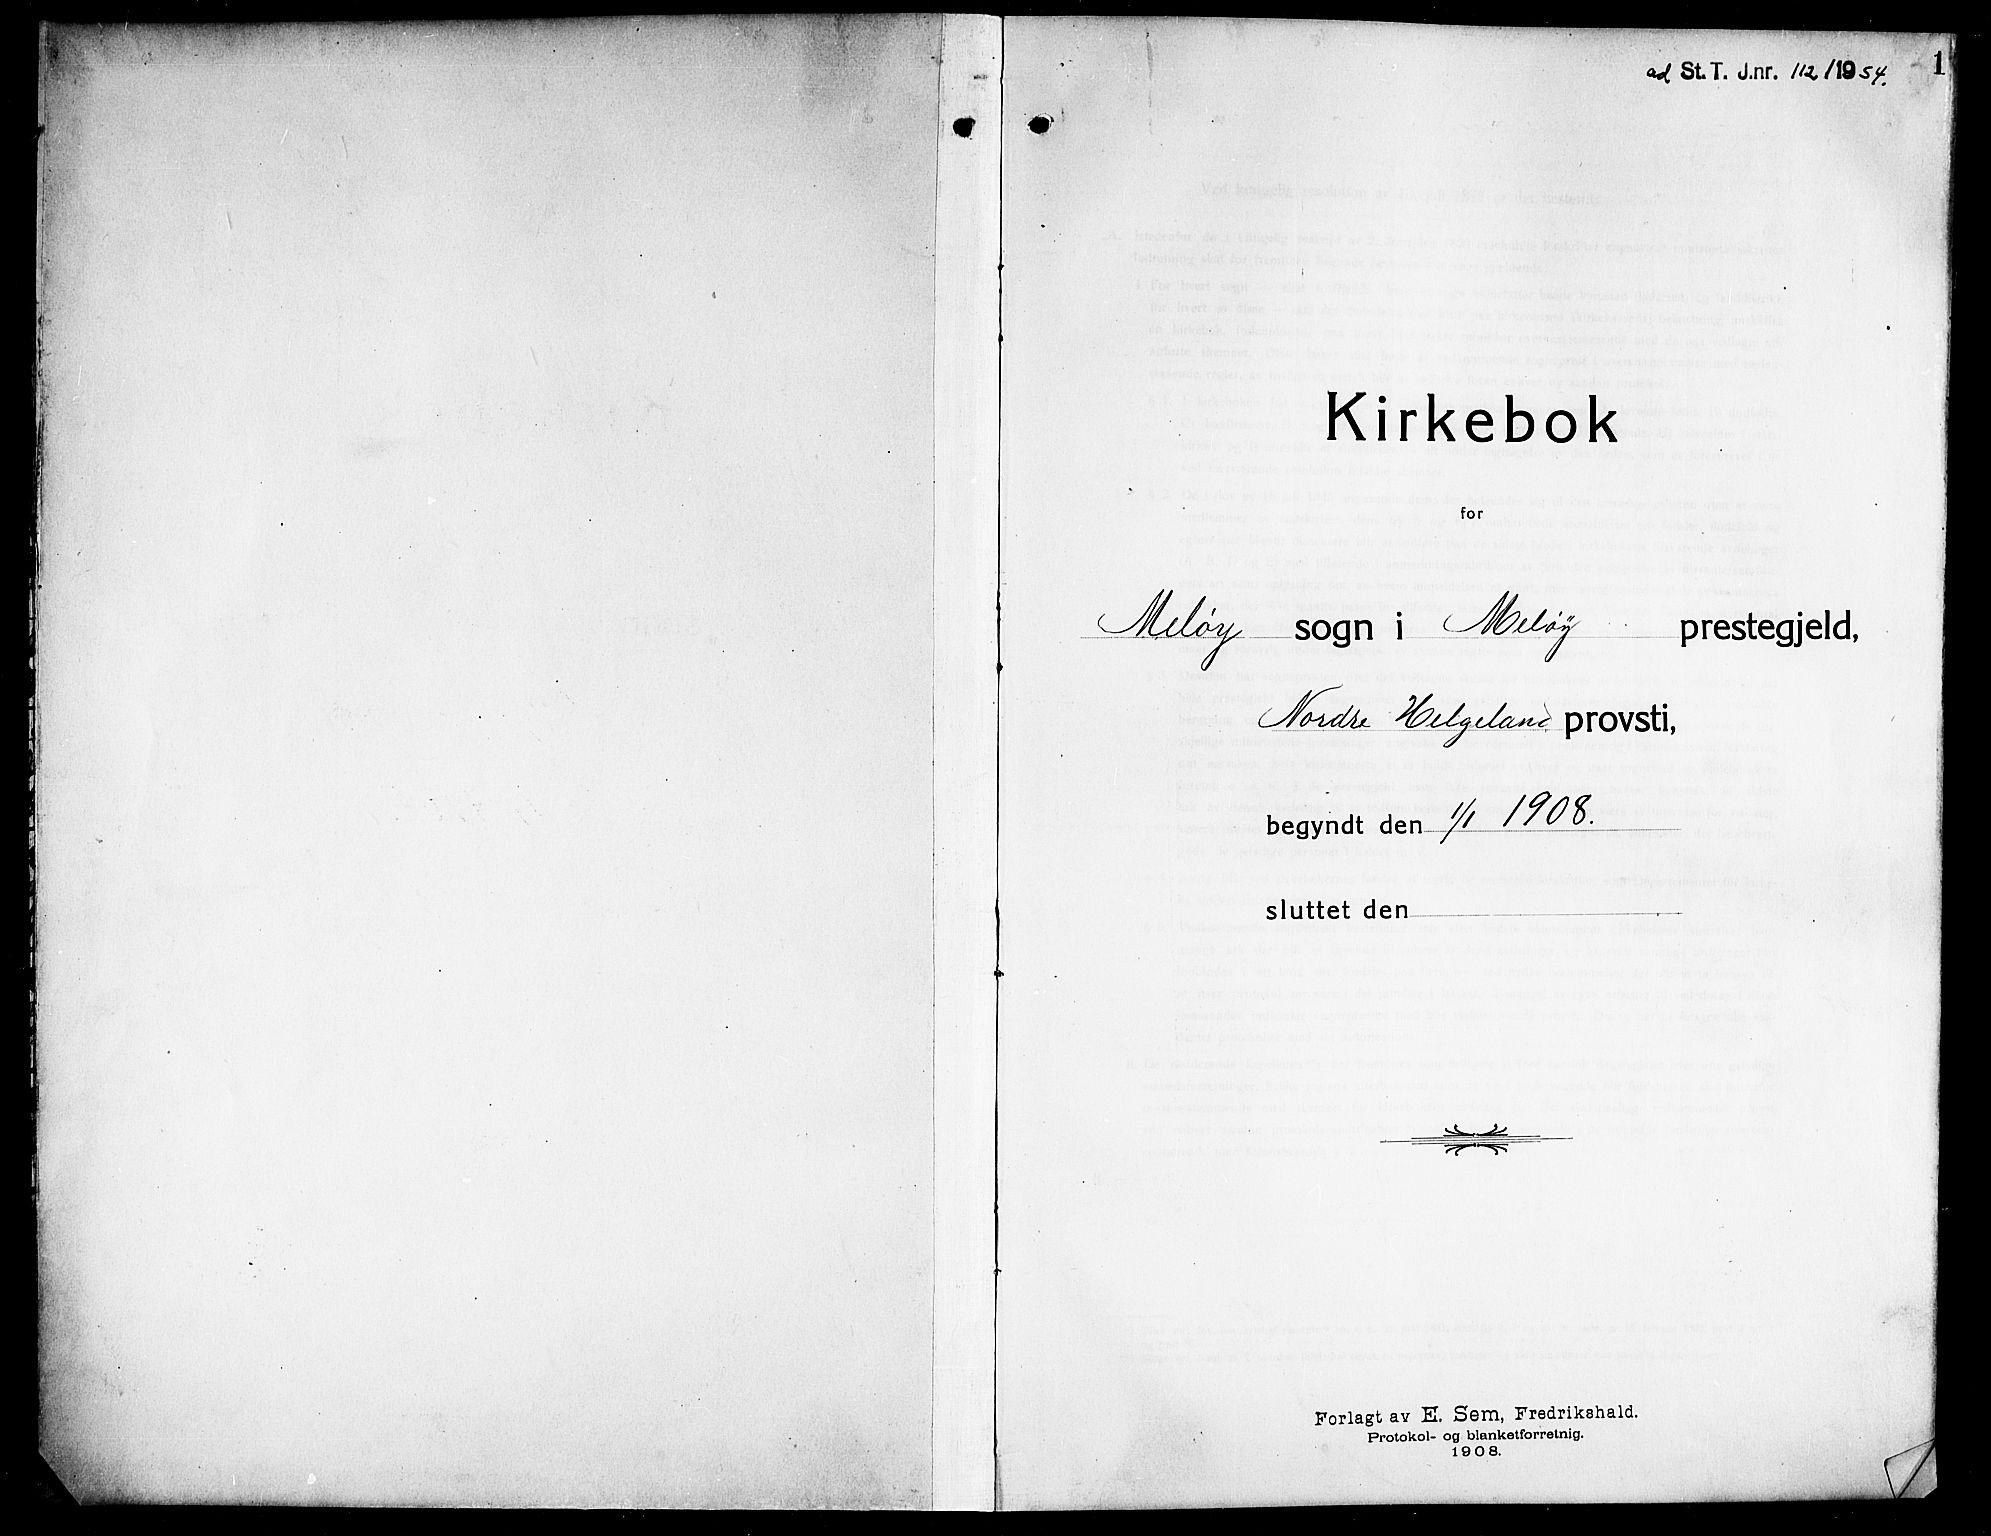 SAT, Ministerialprotokoller, klokkerbøker og fødselsregistre - Nordland, 843/L0639: Klokkerbok nr. 843C08, 1908-1924, s. 1